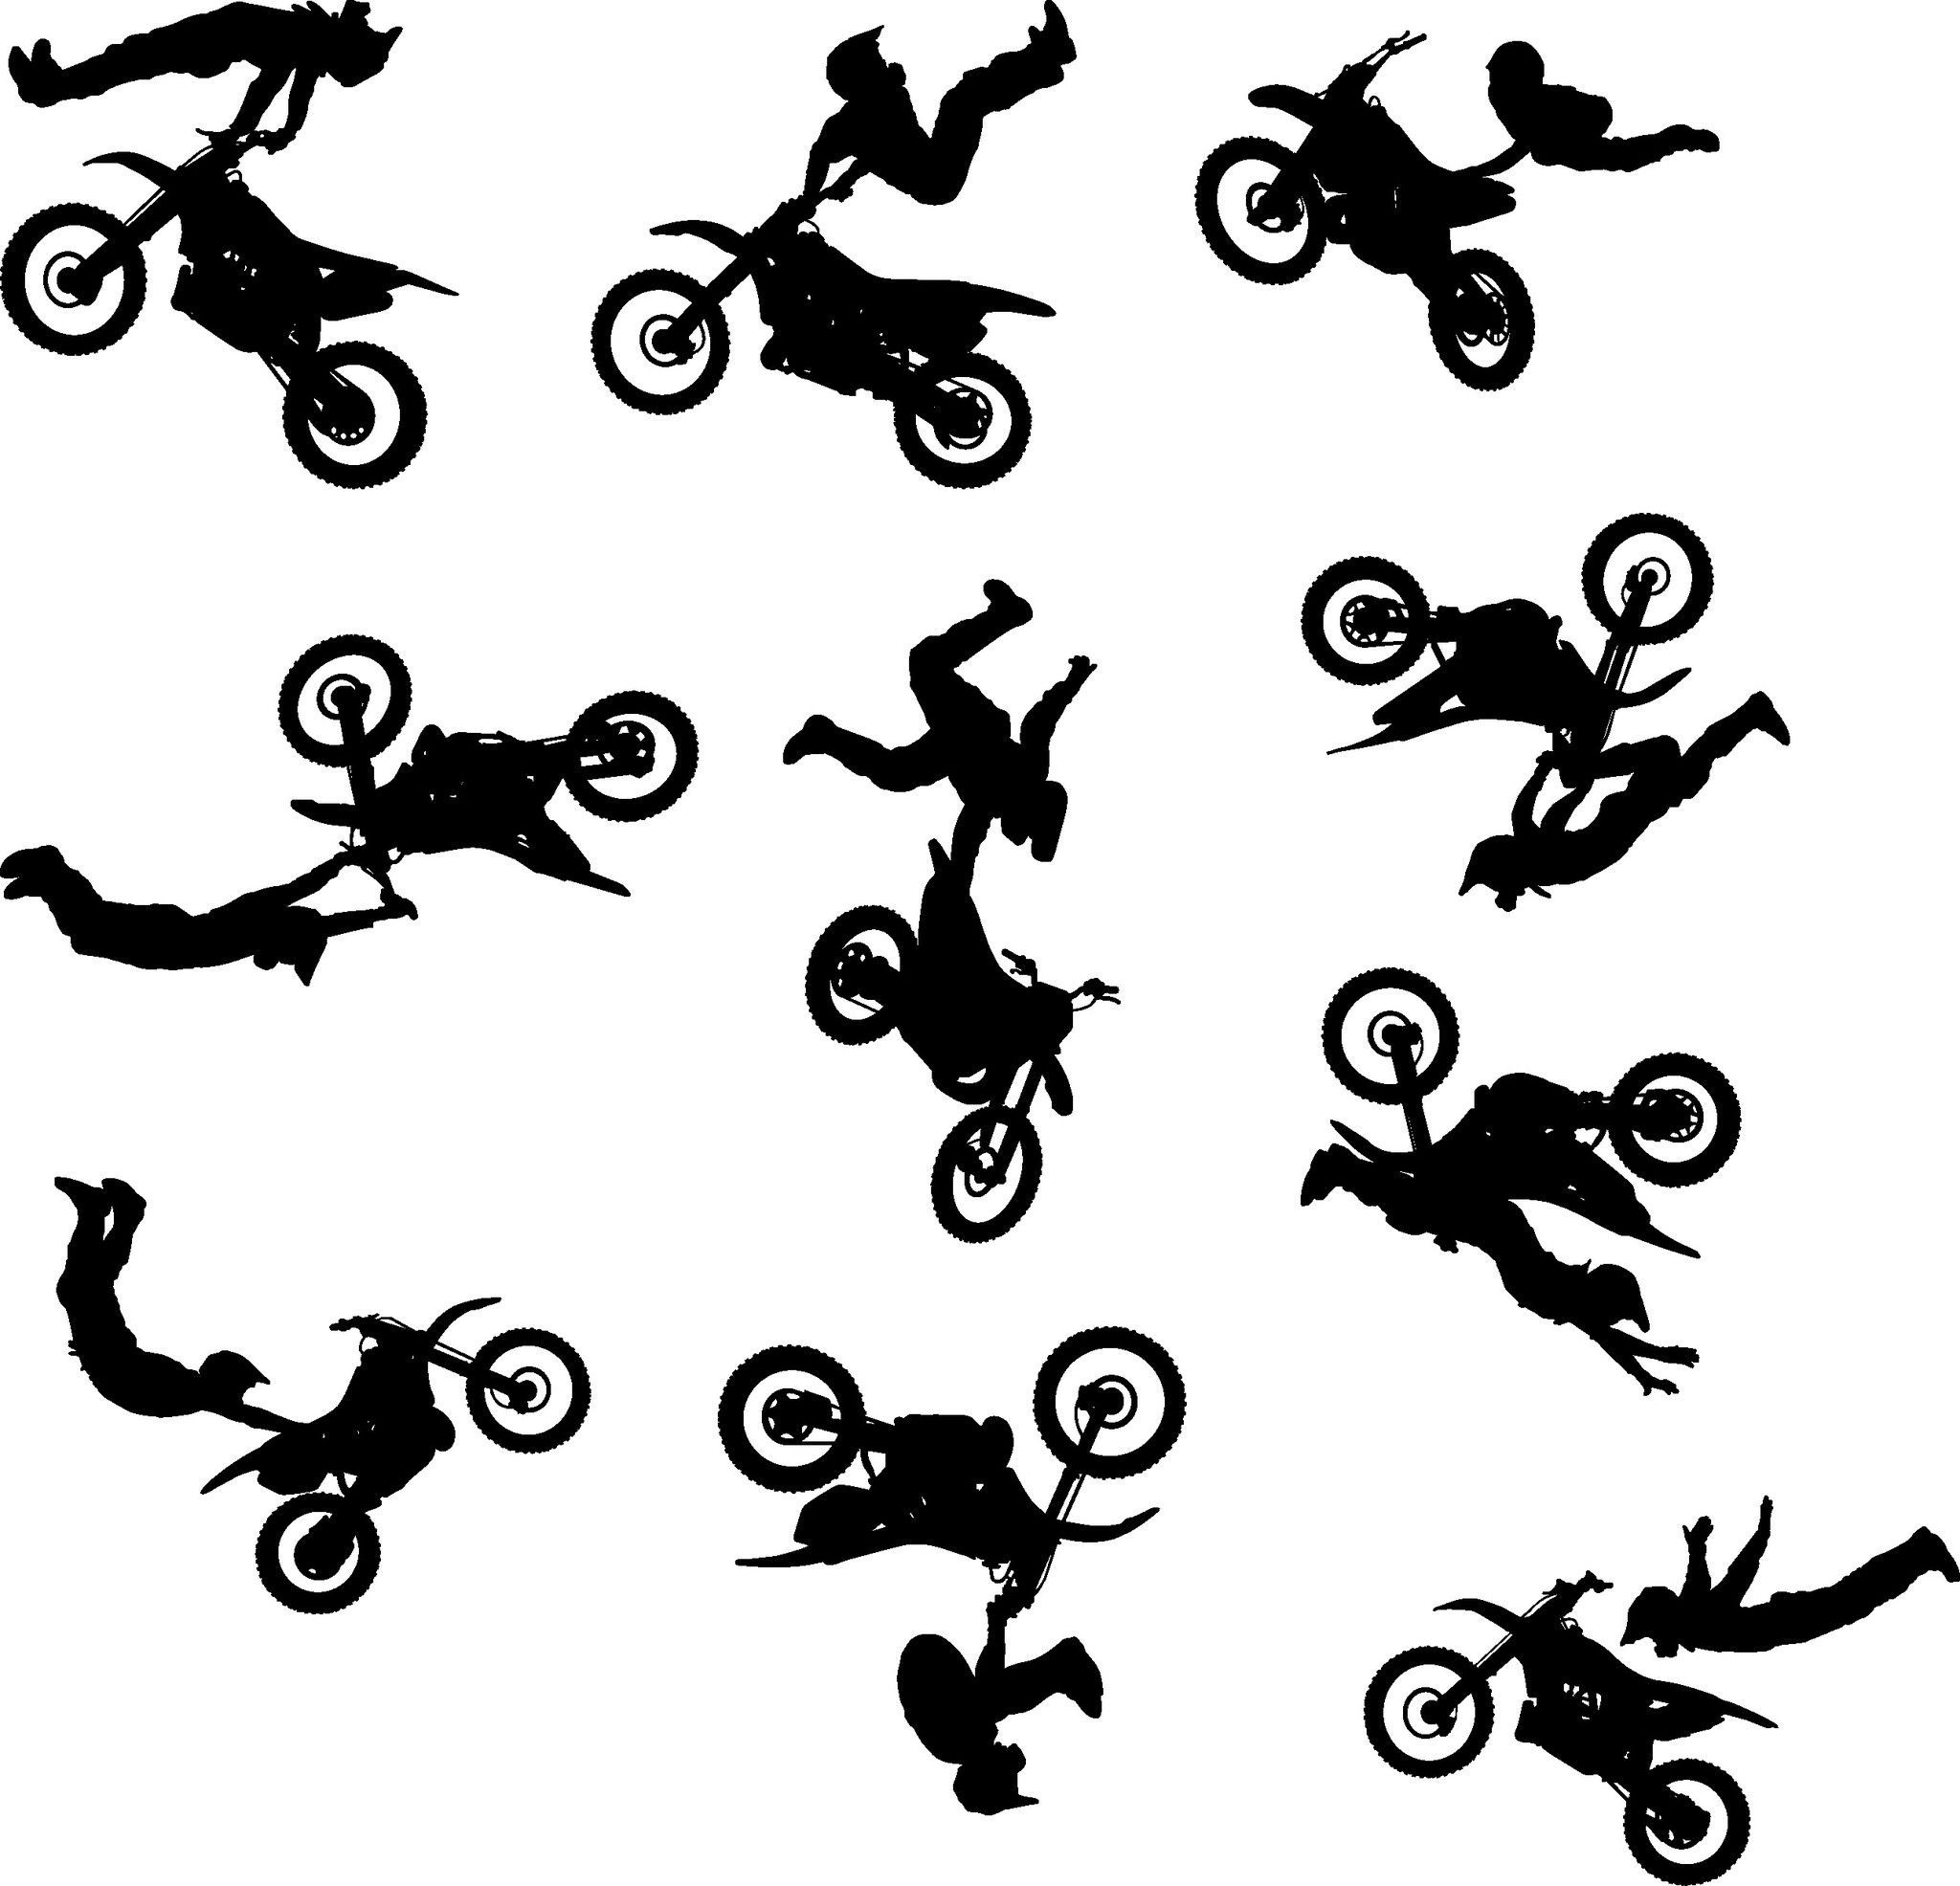 Motocross Dirt Bike Wall Decal Sticker Set Of Ten In